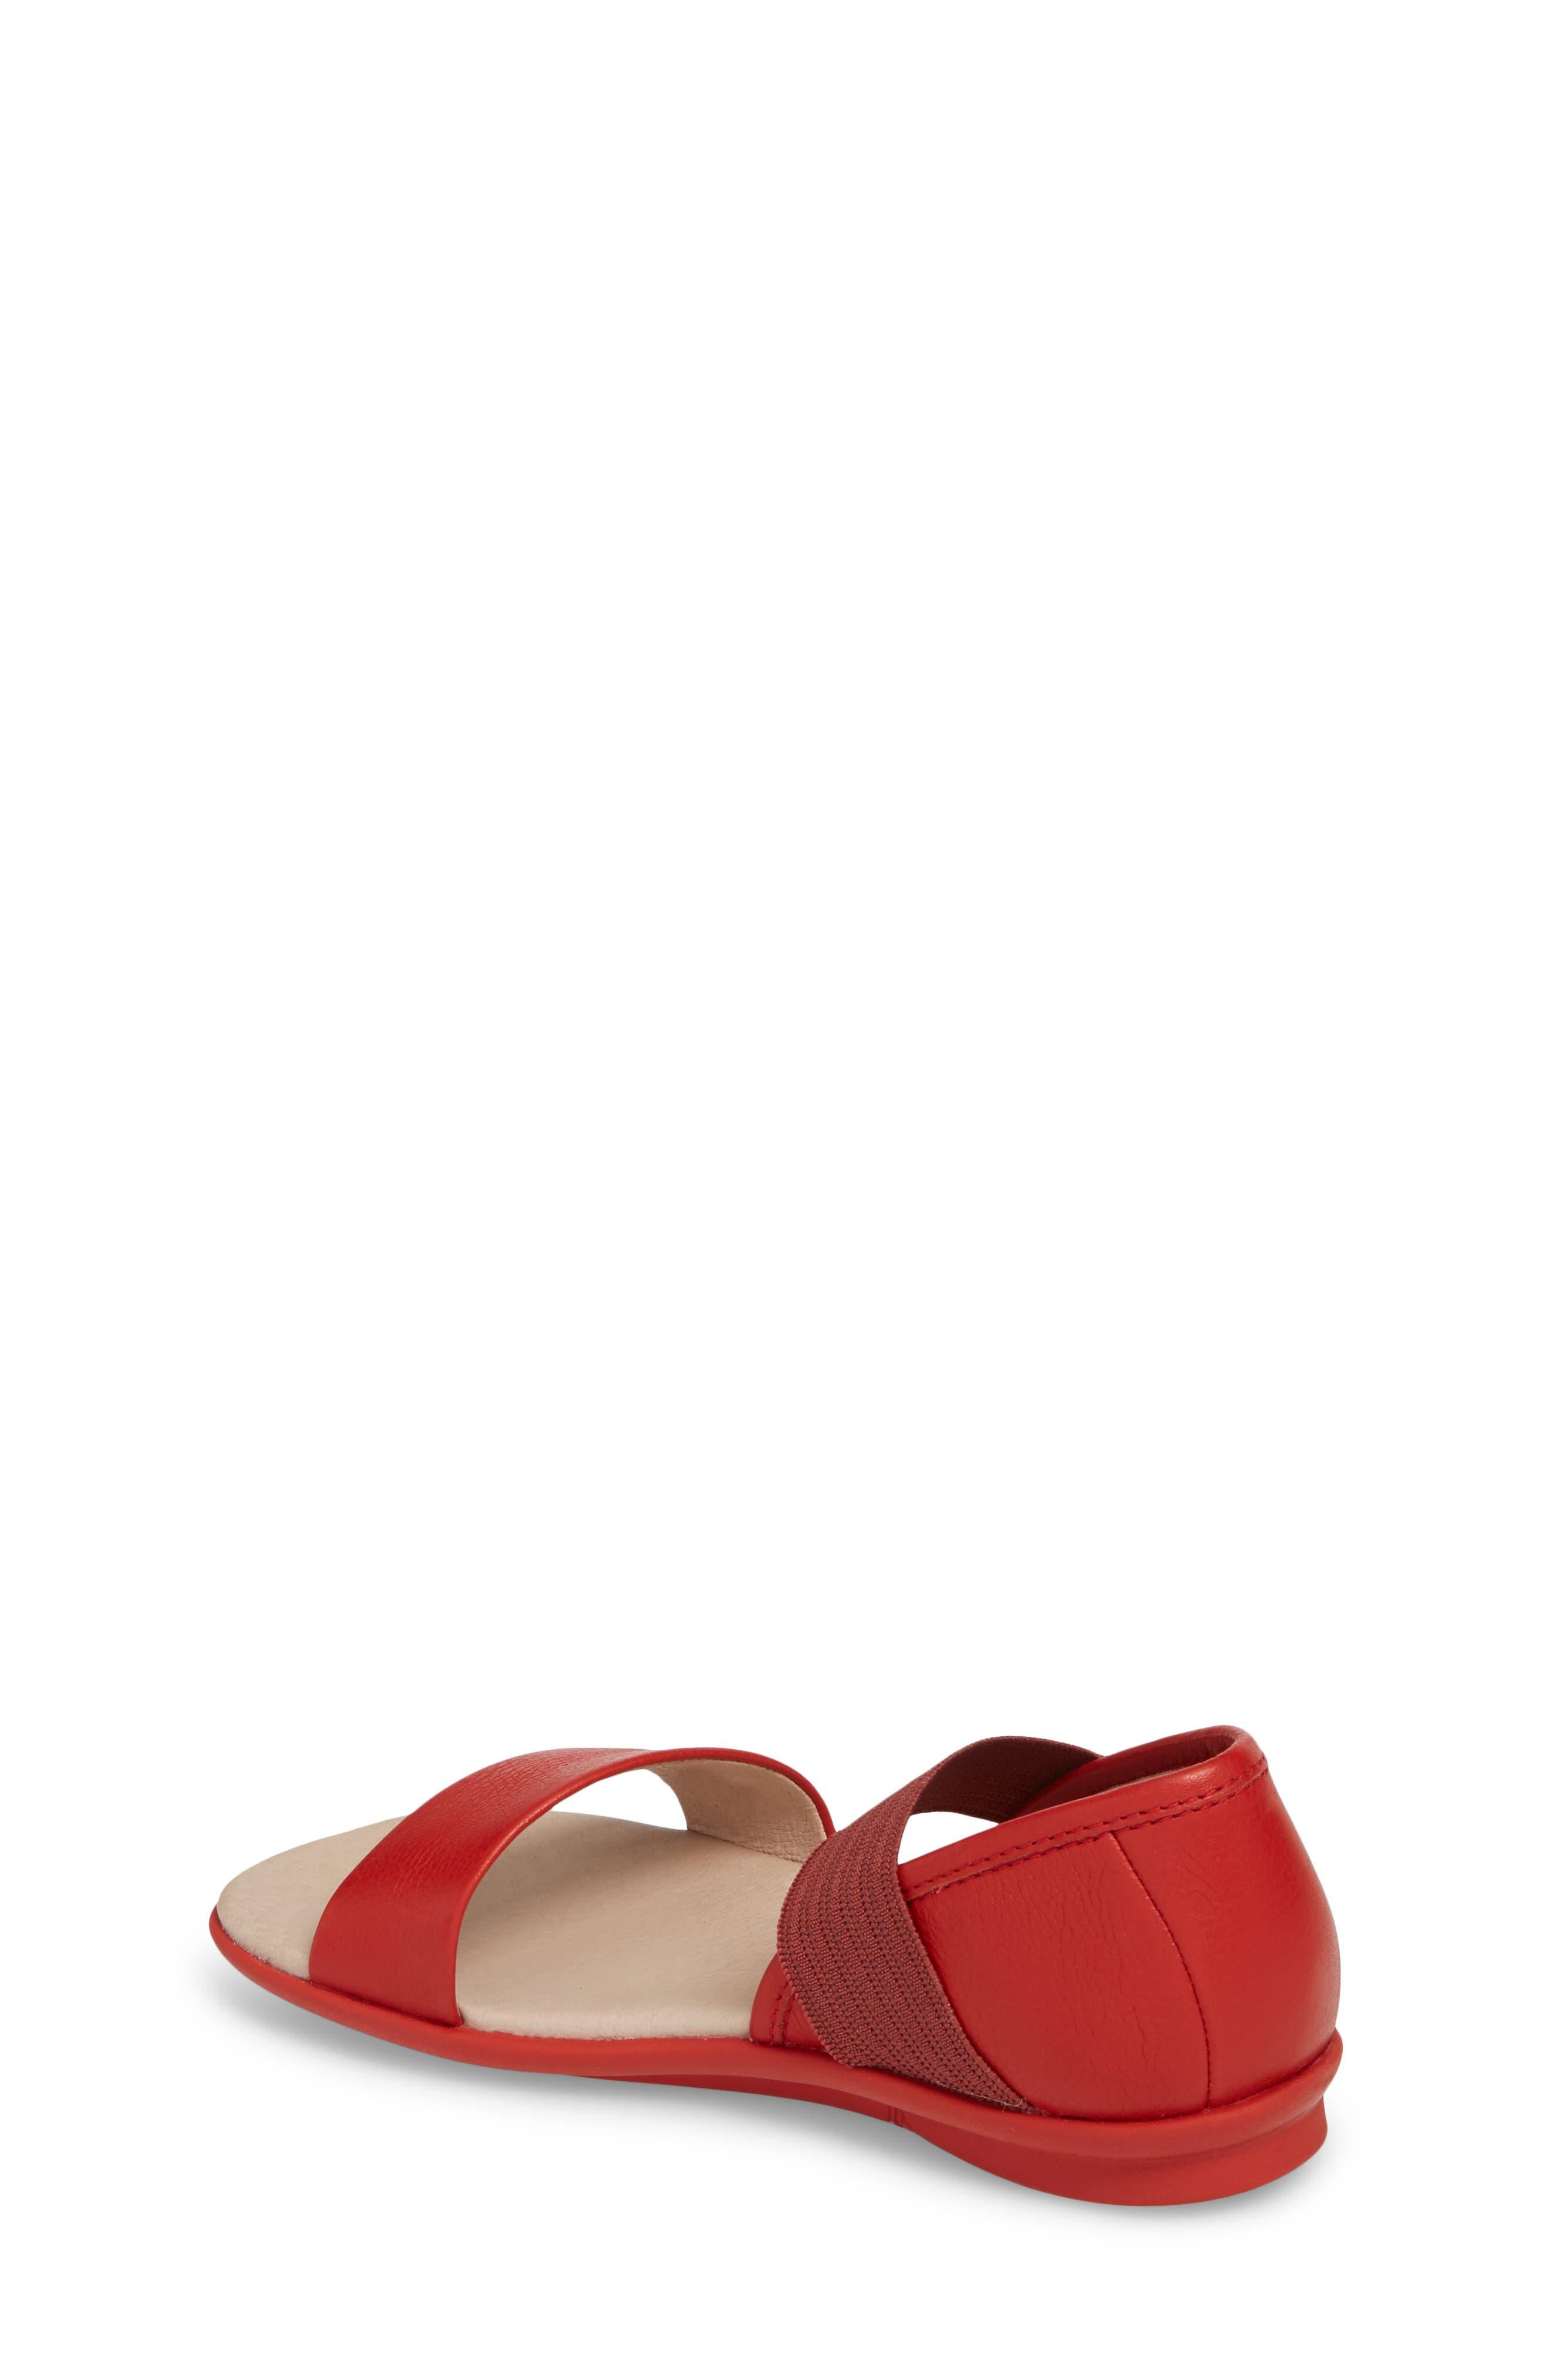 Right Sandal,                             Alternate thumbnail 2, color,                             Red